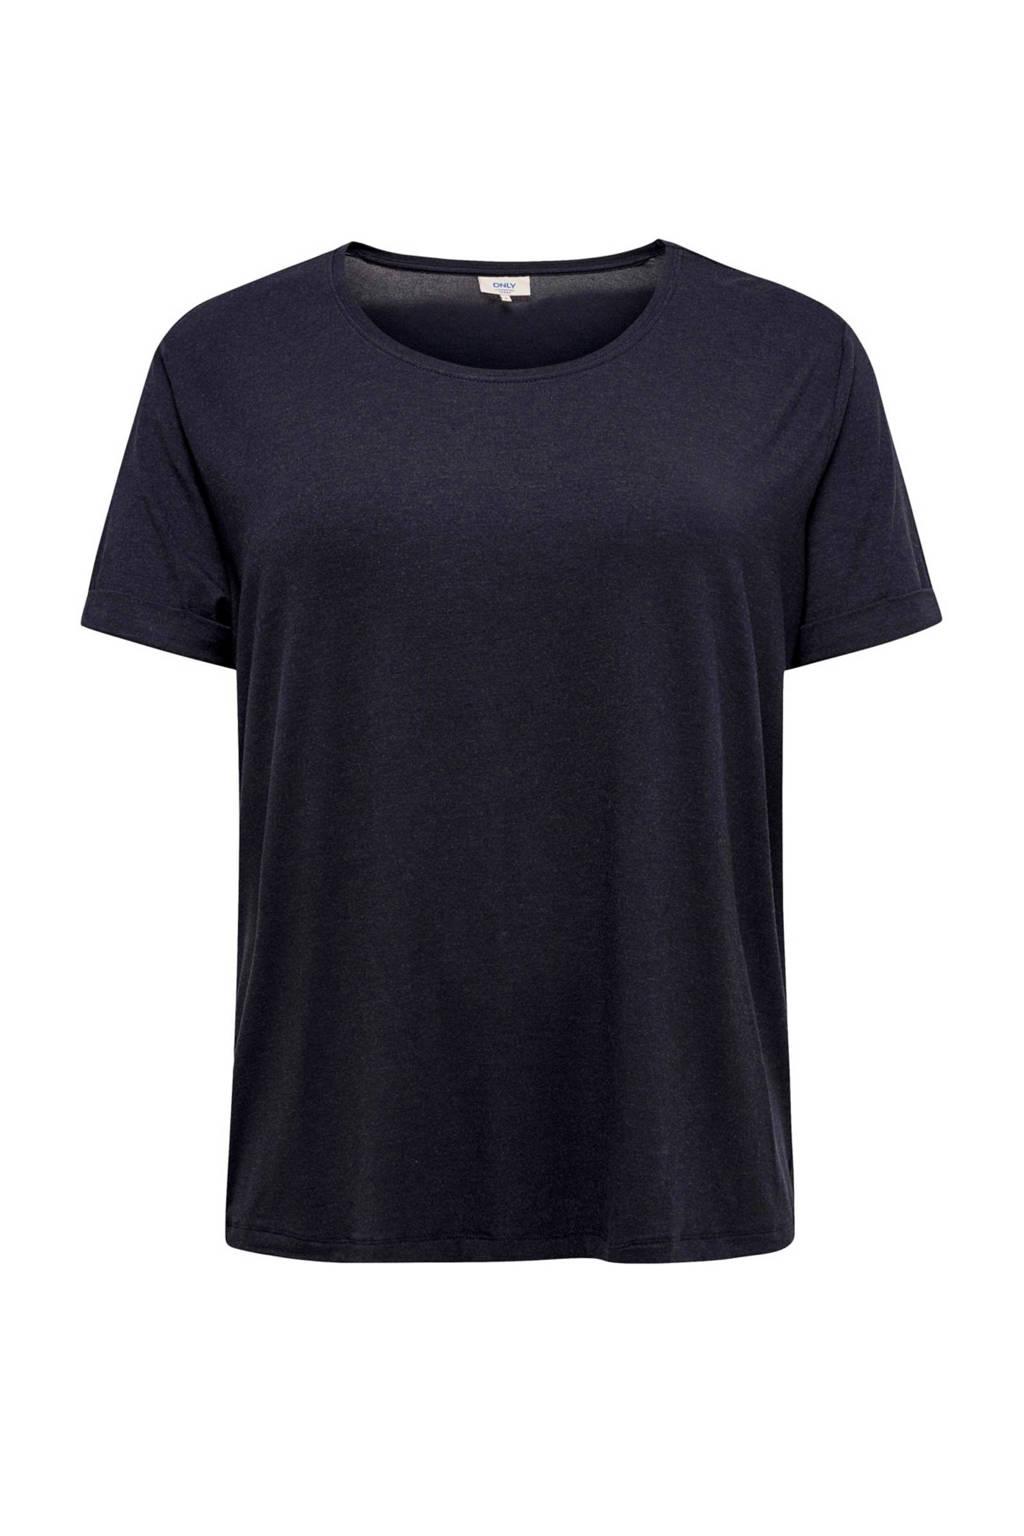 ONLY carmakoma T-shirt donkerblauw, Donkerblauw